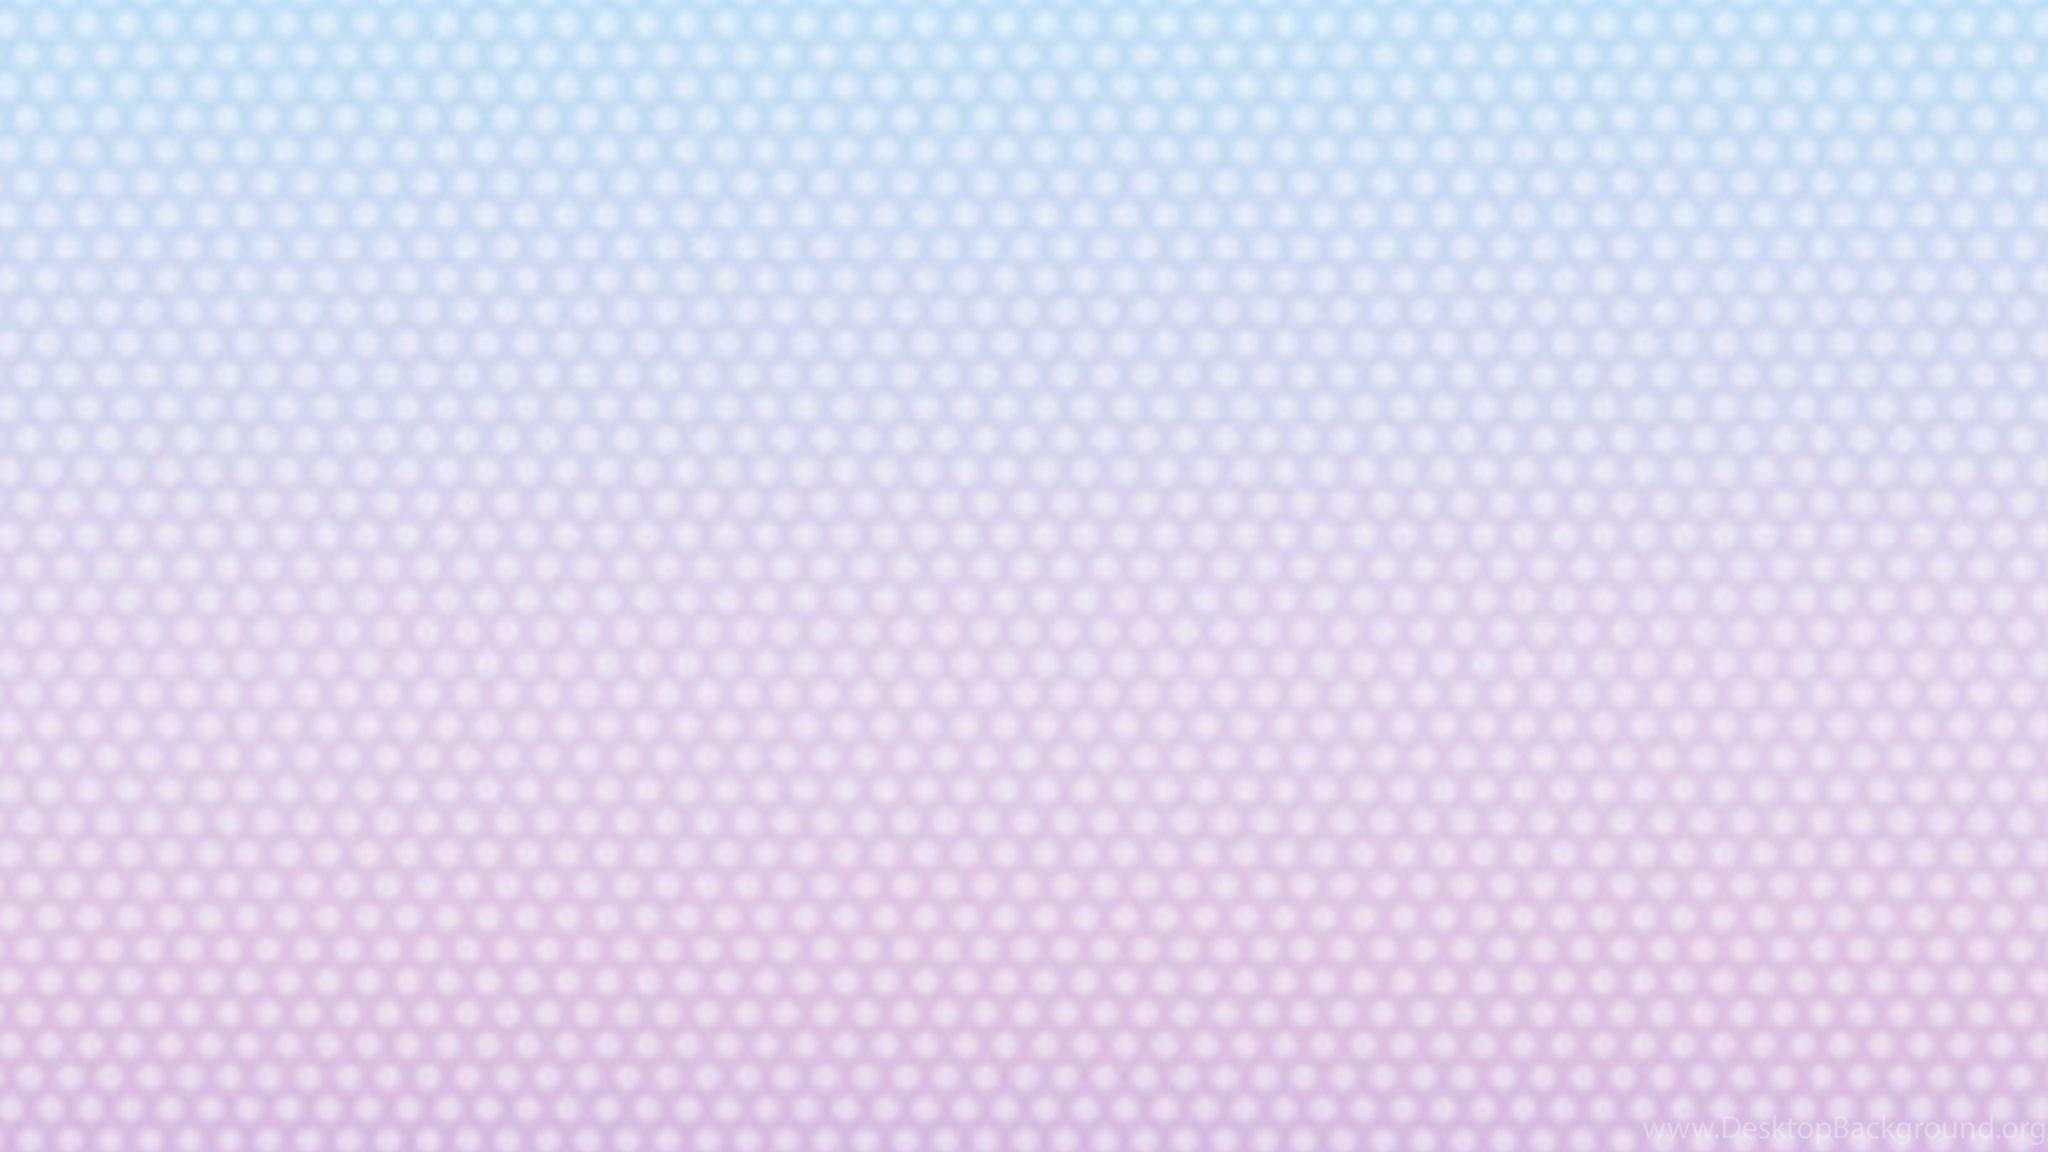 Ios 7 Iphone Wallpaper: Simple Circle Dot Pattern IOS 7 IPad Wallpapers HD Desktop